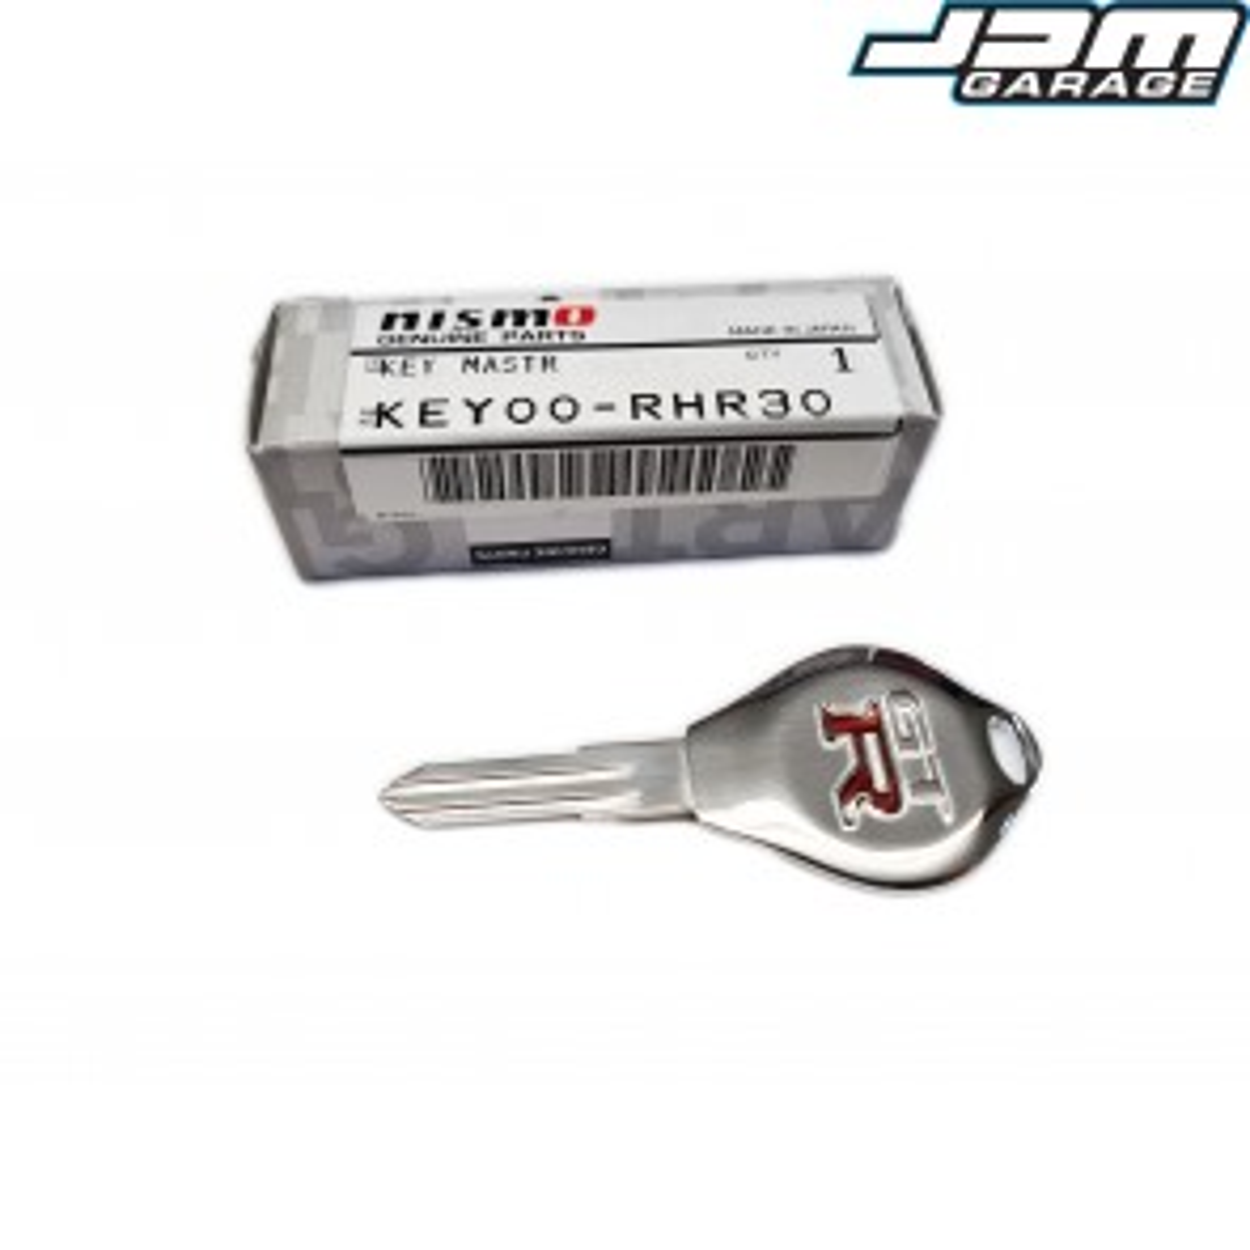 Genuine New Nismo Heritage Master Key Blank Uncut Nissan Skyline R32 R33 GTST GTR / Silvia S13 S14 / Stagea C34 / Cefiro A31 / Laurel A33 / Pulsar GTIR KEY00-RHR30